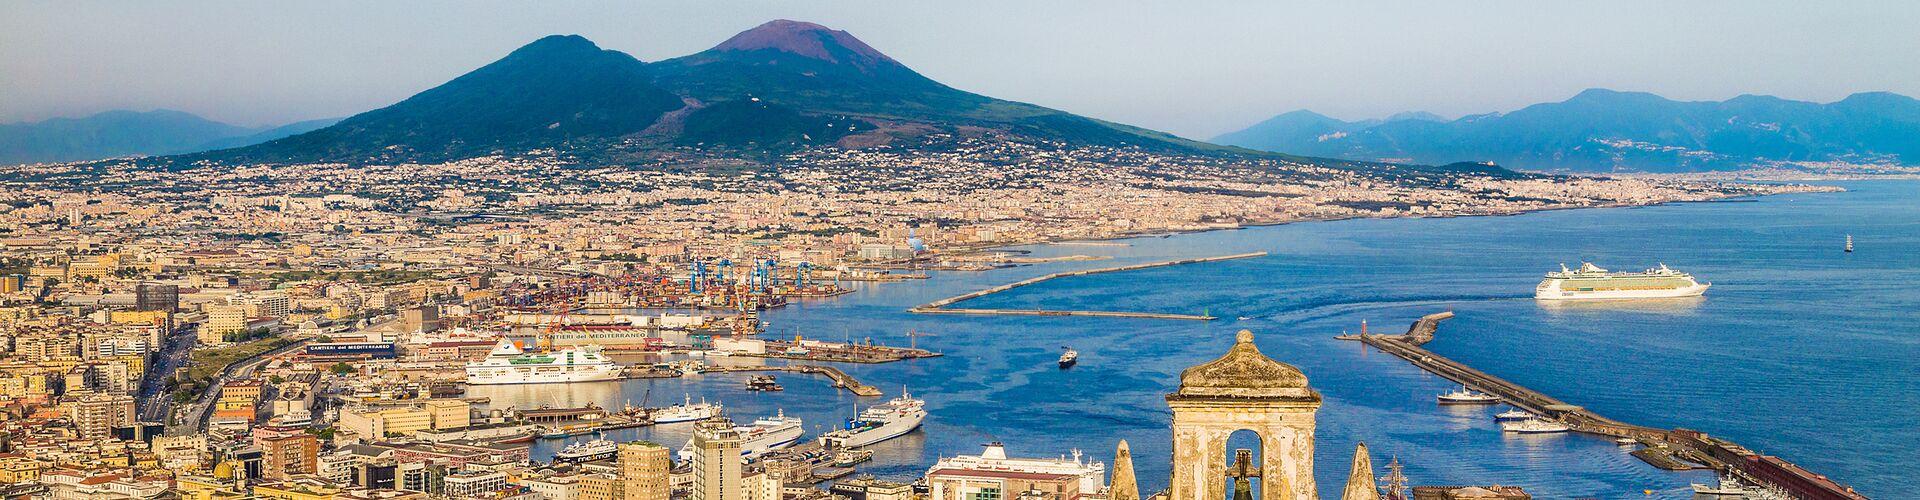 Rome to Amalfi